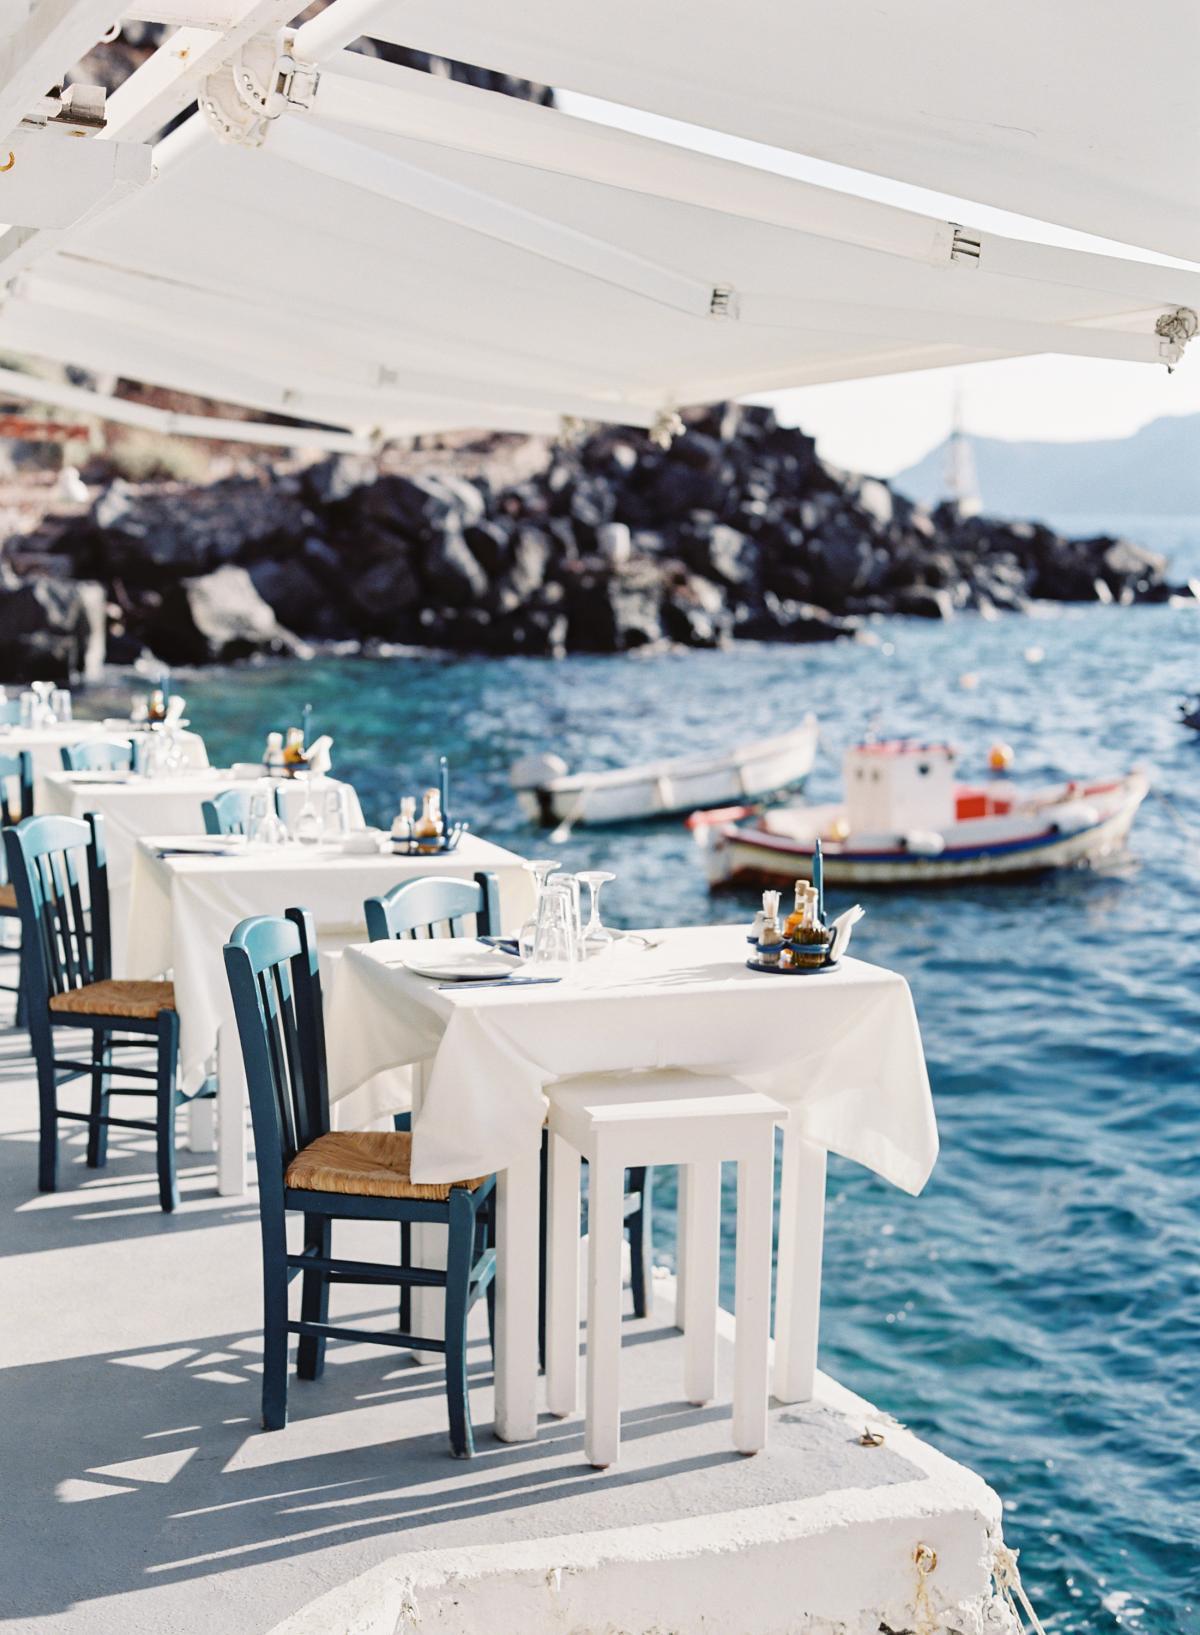 Santorini greece travel photos by omalley photographers 0005